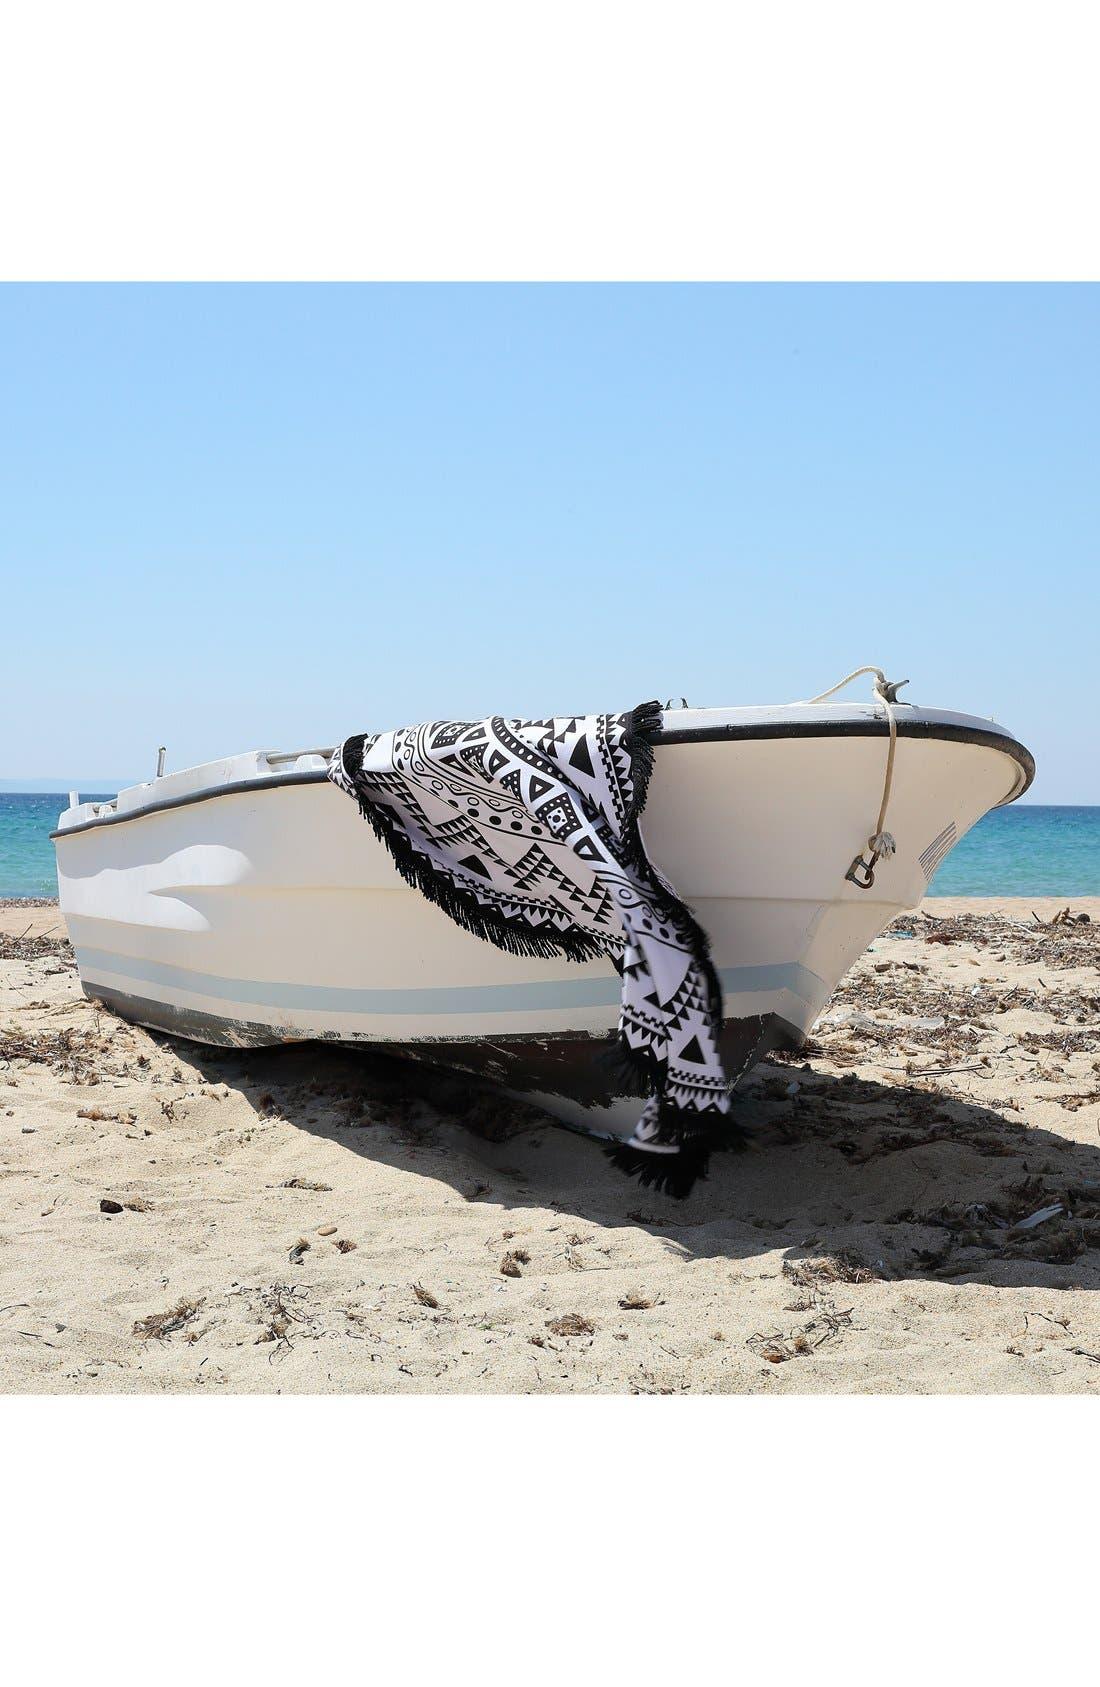 'Kilim' Turkish Pestemal Round Beach Towel,                             Alternate thumbnail 5, color,                             BLACK/ WHITE